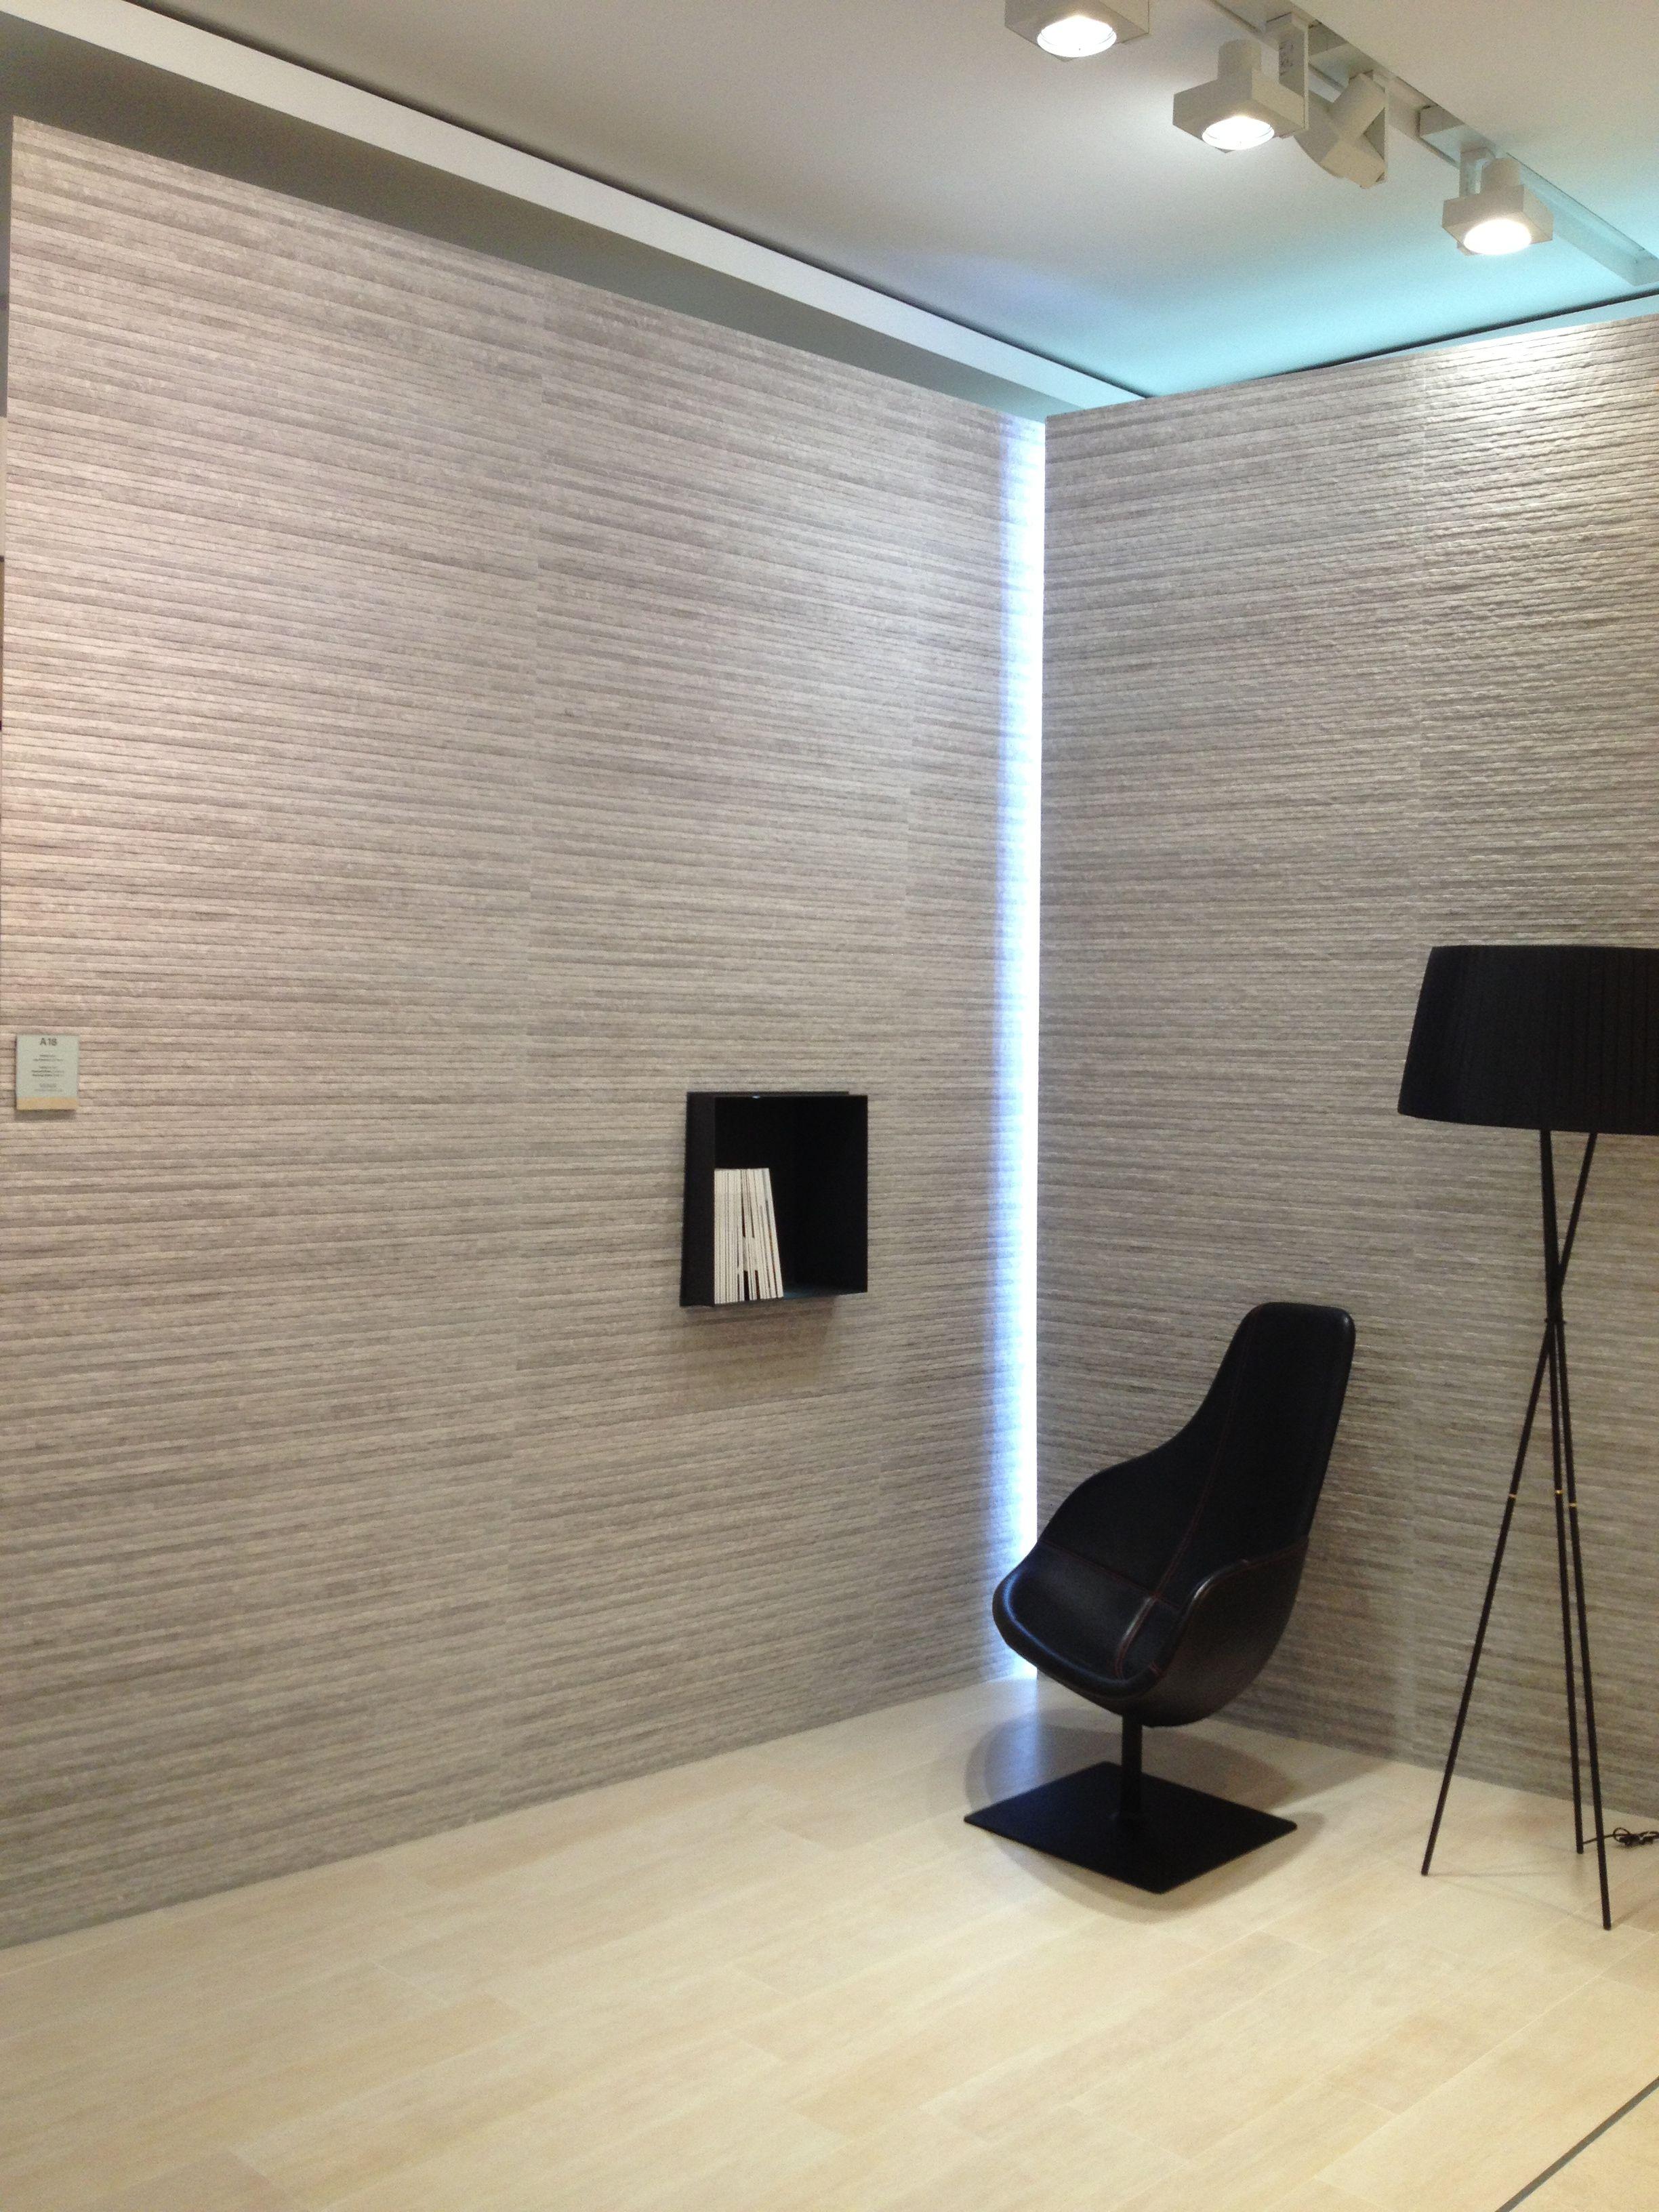 Afrikano Tile And Decor Pinafrikano Tile & Decor On Venis_Porcelanosa Our Tile